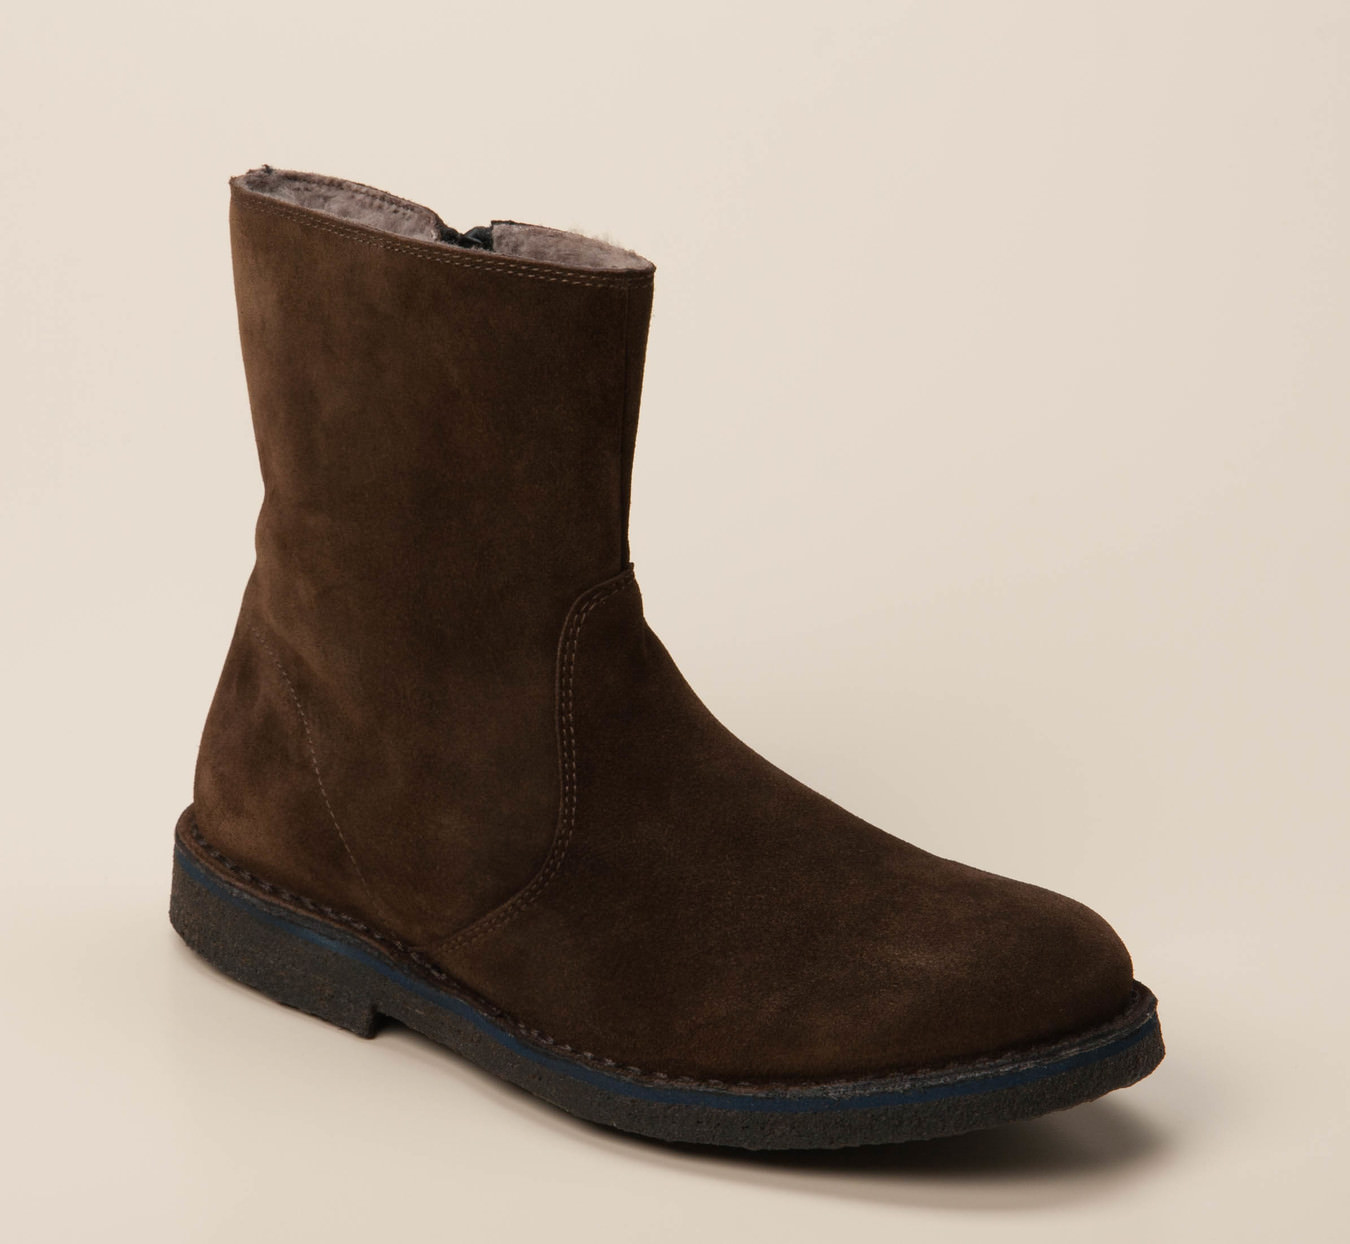 f2bfa90ac7264c Konstantin Starke Herren Boots in dunkelbraun kaufen